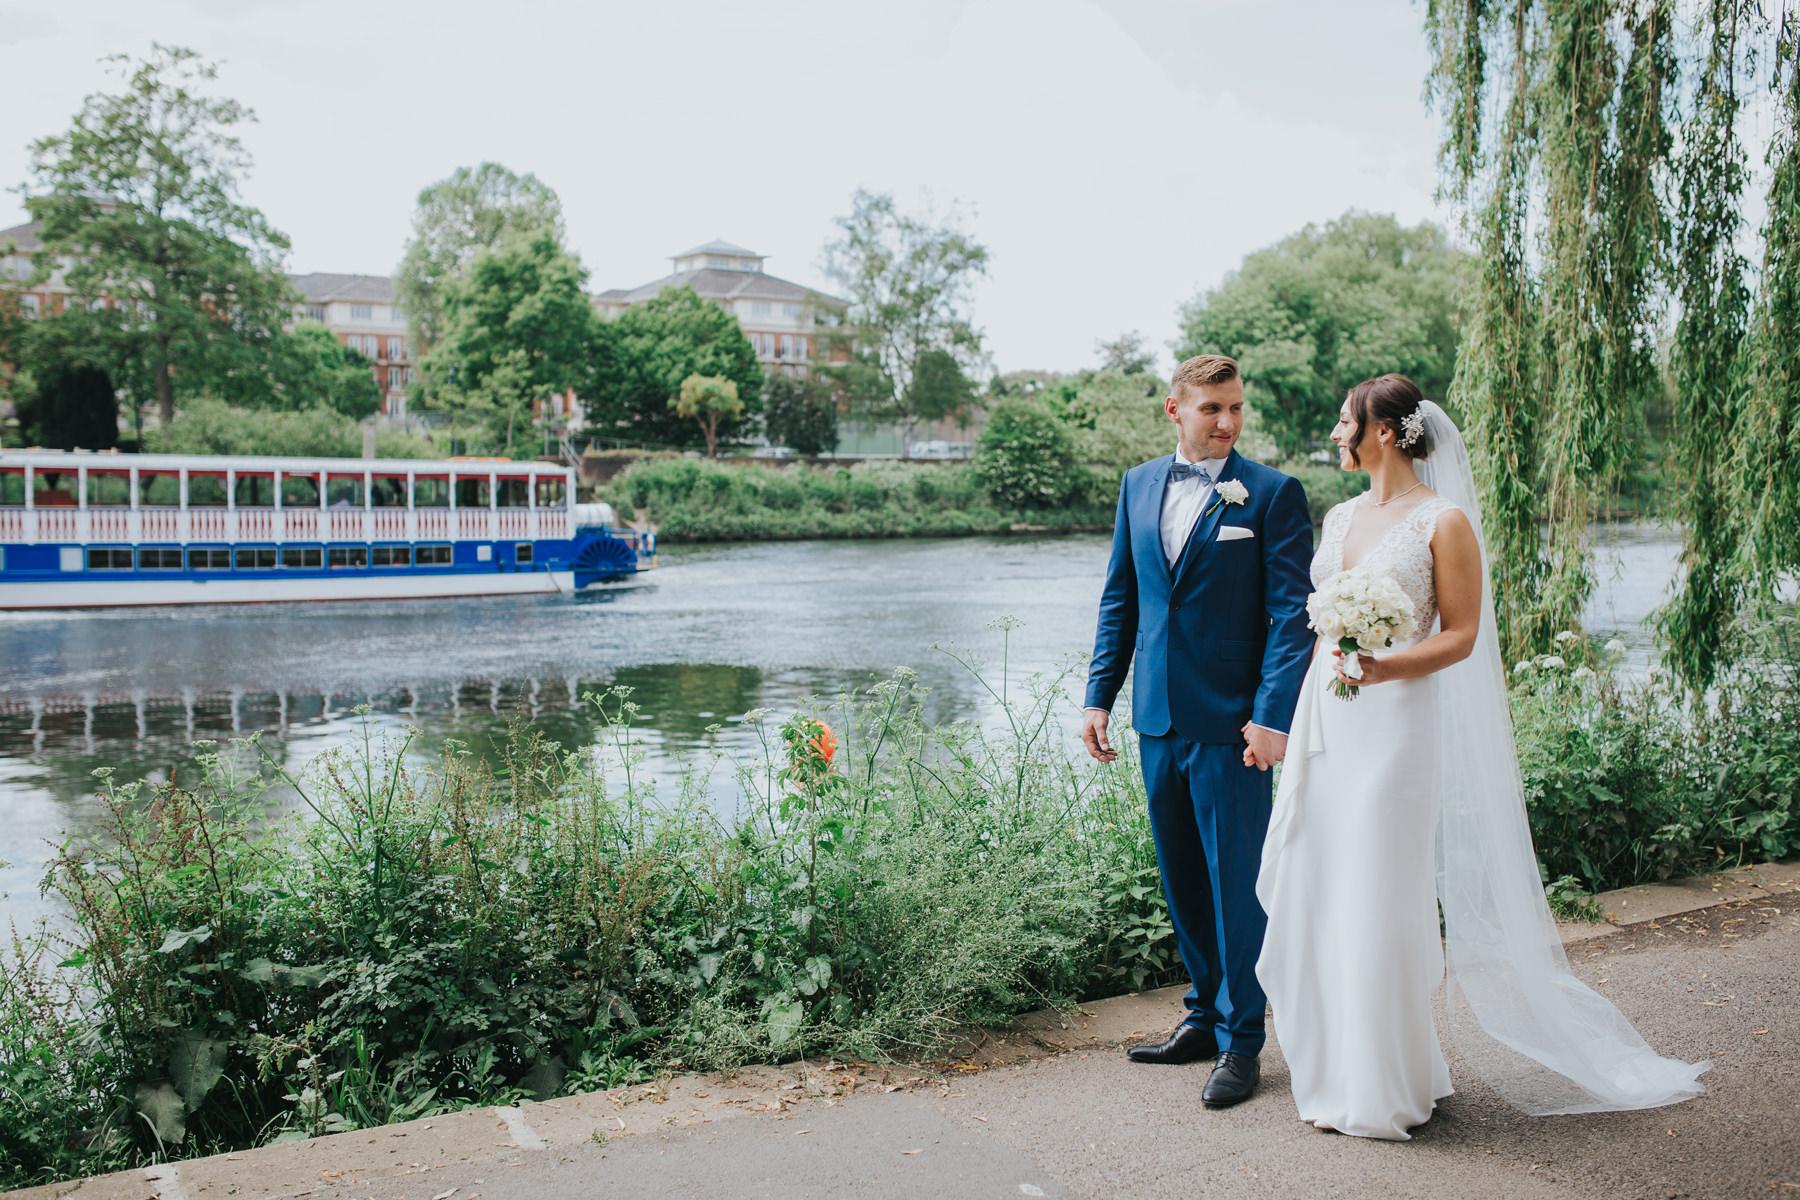 CRL-358-The Bingham wedding Richmond-Claire Rob bridal couple portraits on Thamespath.jpg